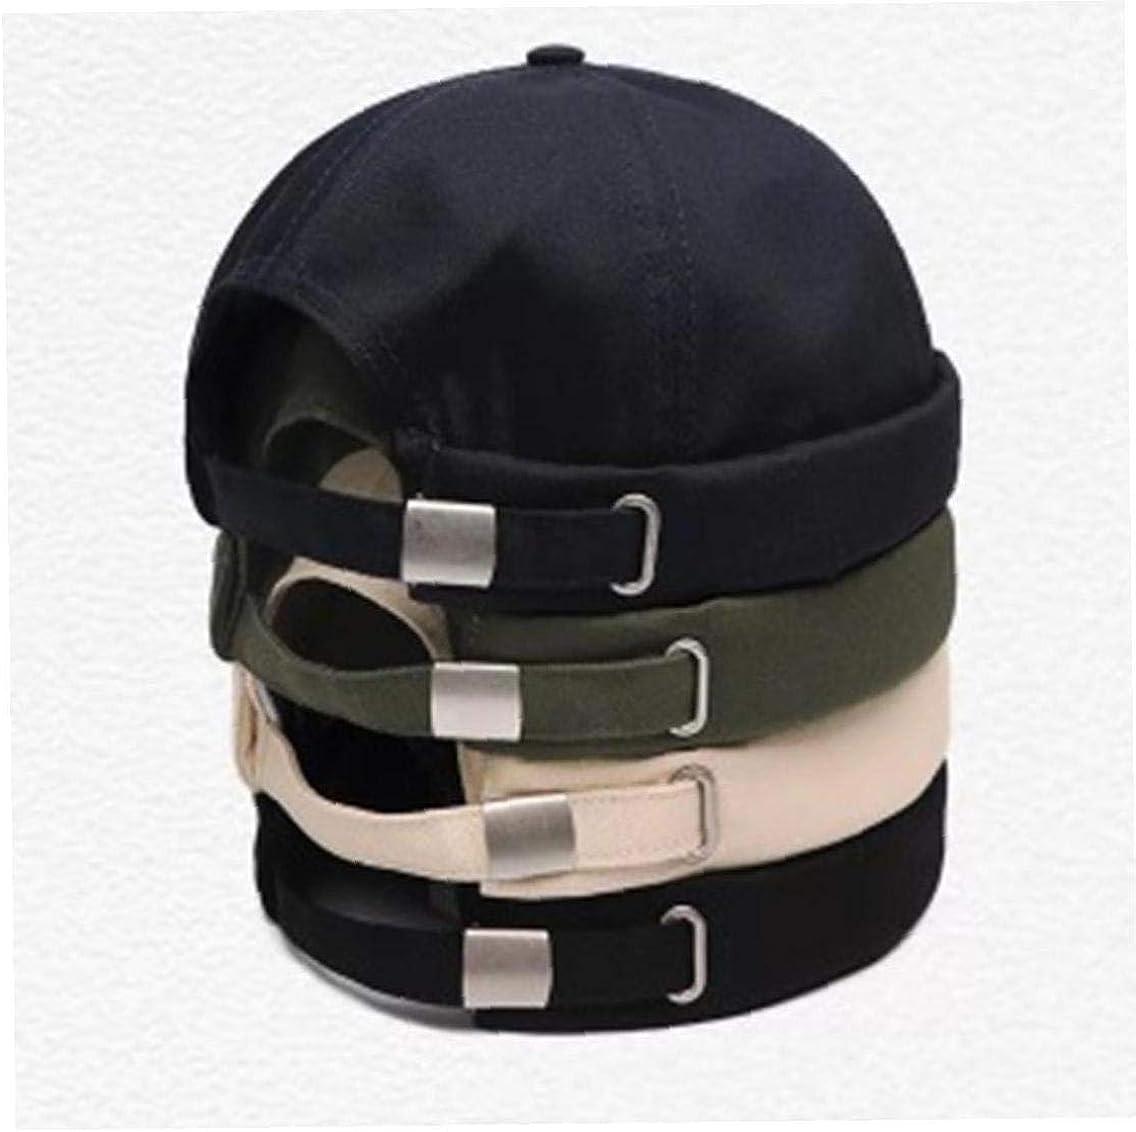 Adjustable Hats Docker Cap Skullcap Sailor Cap Rolled Cuff Retro Brimless Beani Hat for Unisex